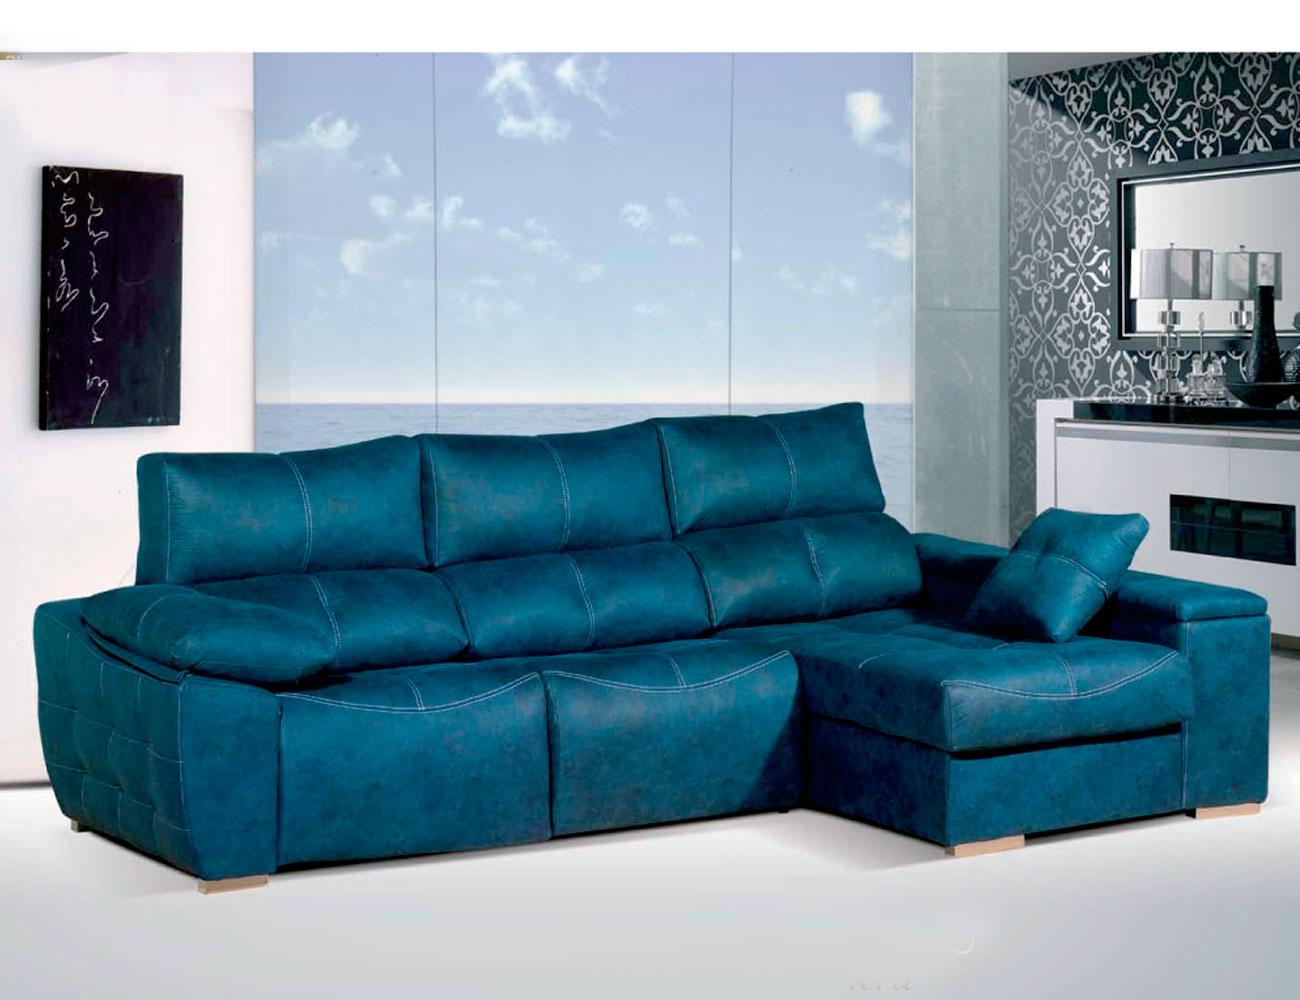 Sofa chaiselongue relax 2 motores anti manchas turquesa28